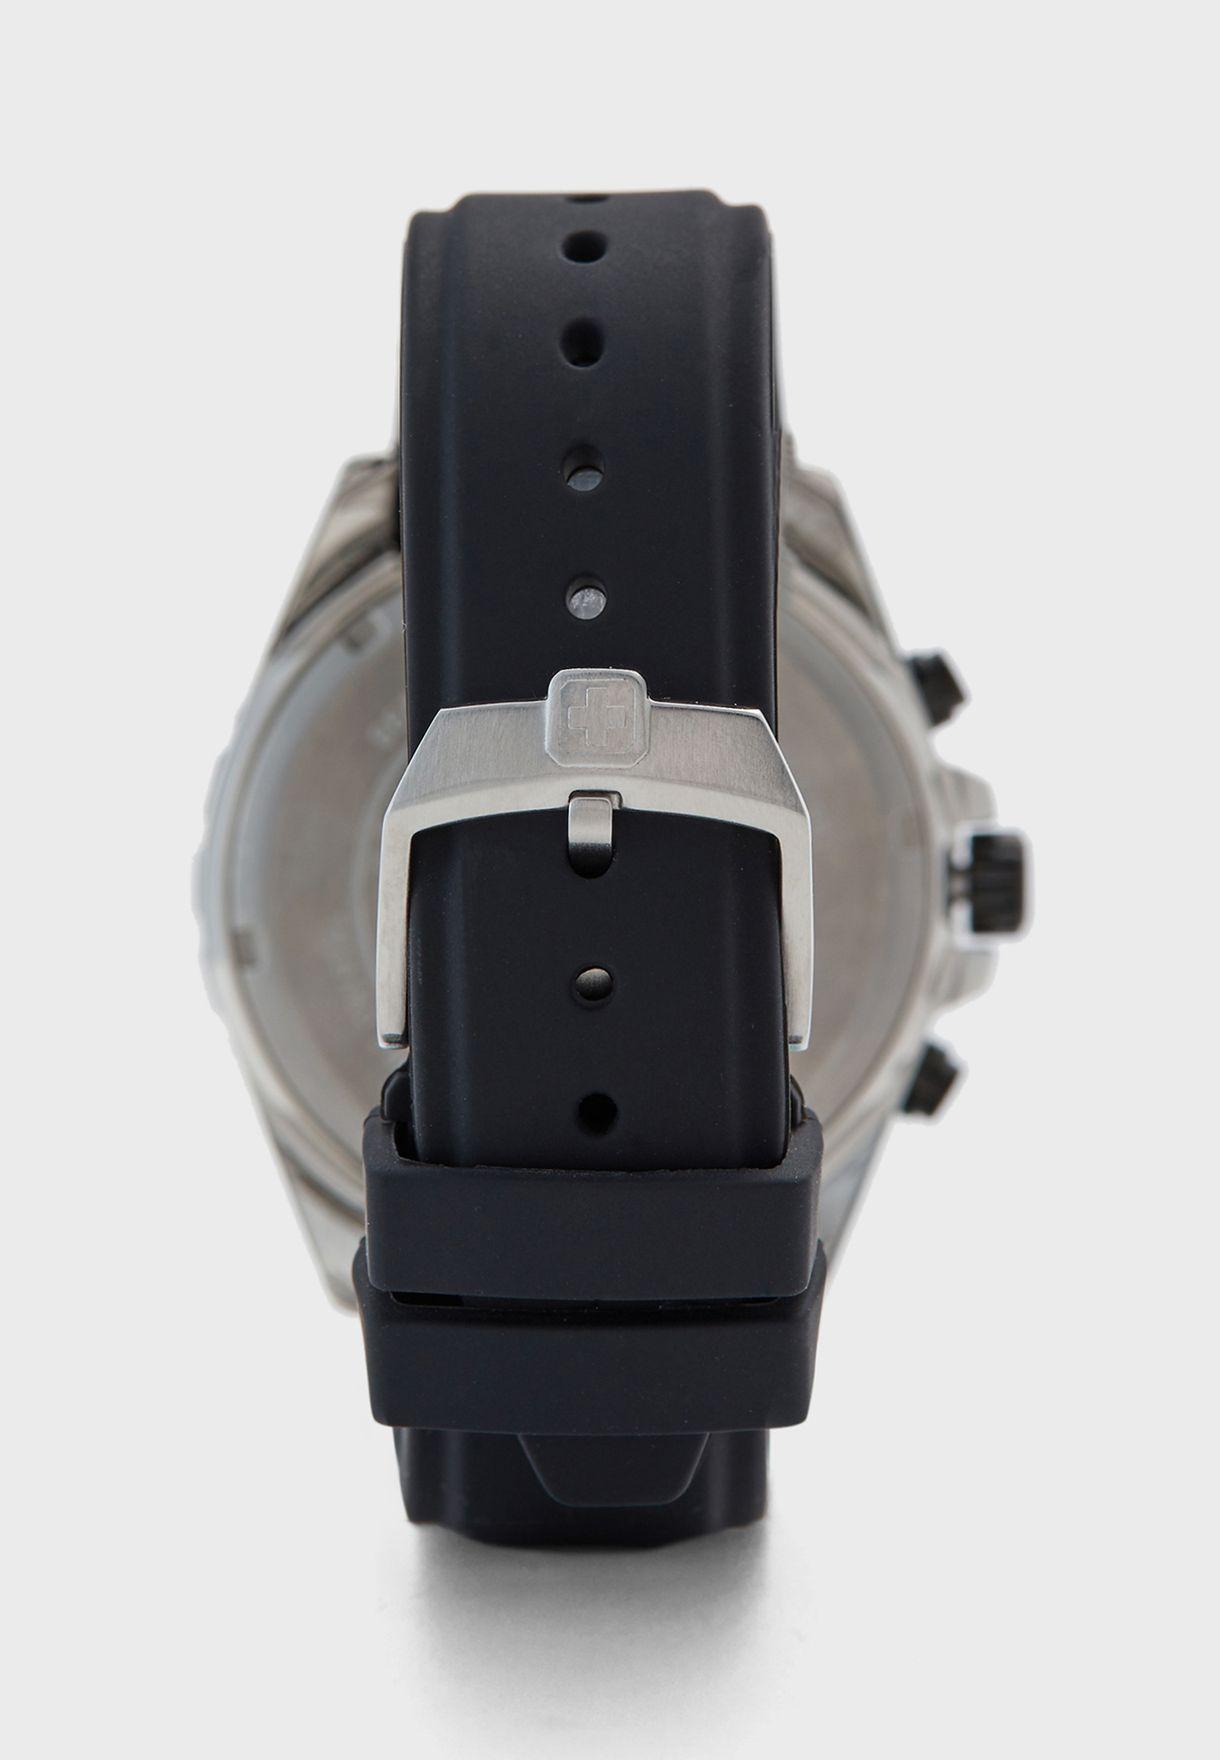 W S6-4298.3.04.009 Multimission Watch